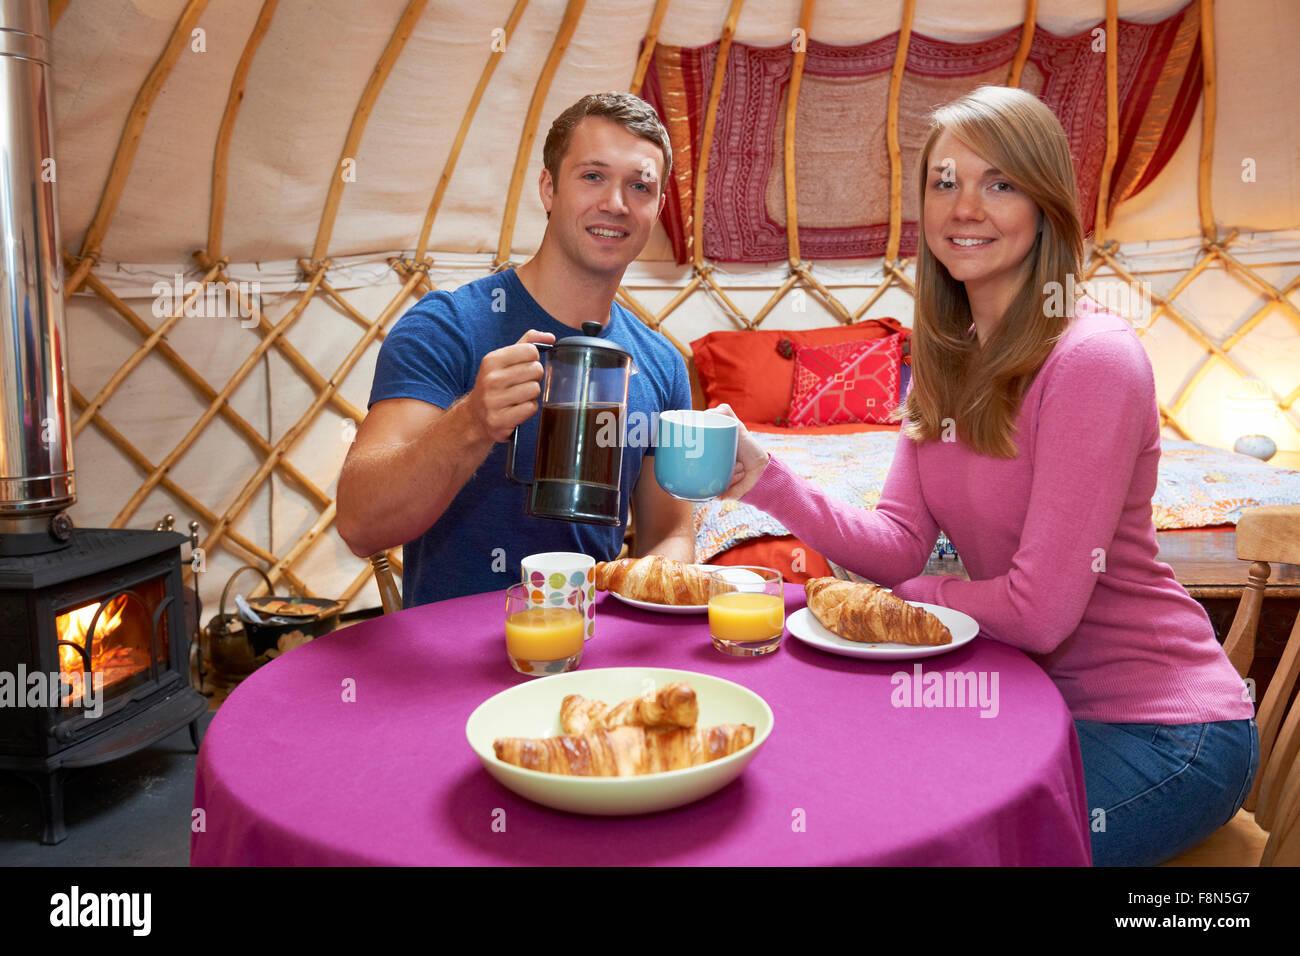 Couple Enjoying Holiday Camping In Traditional Yurt - Stock Image